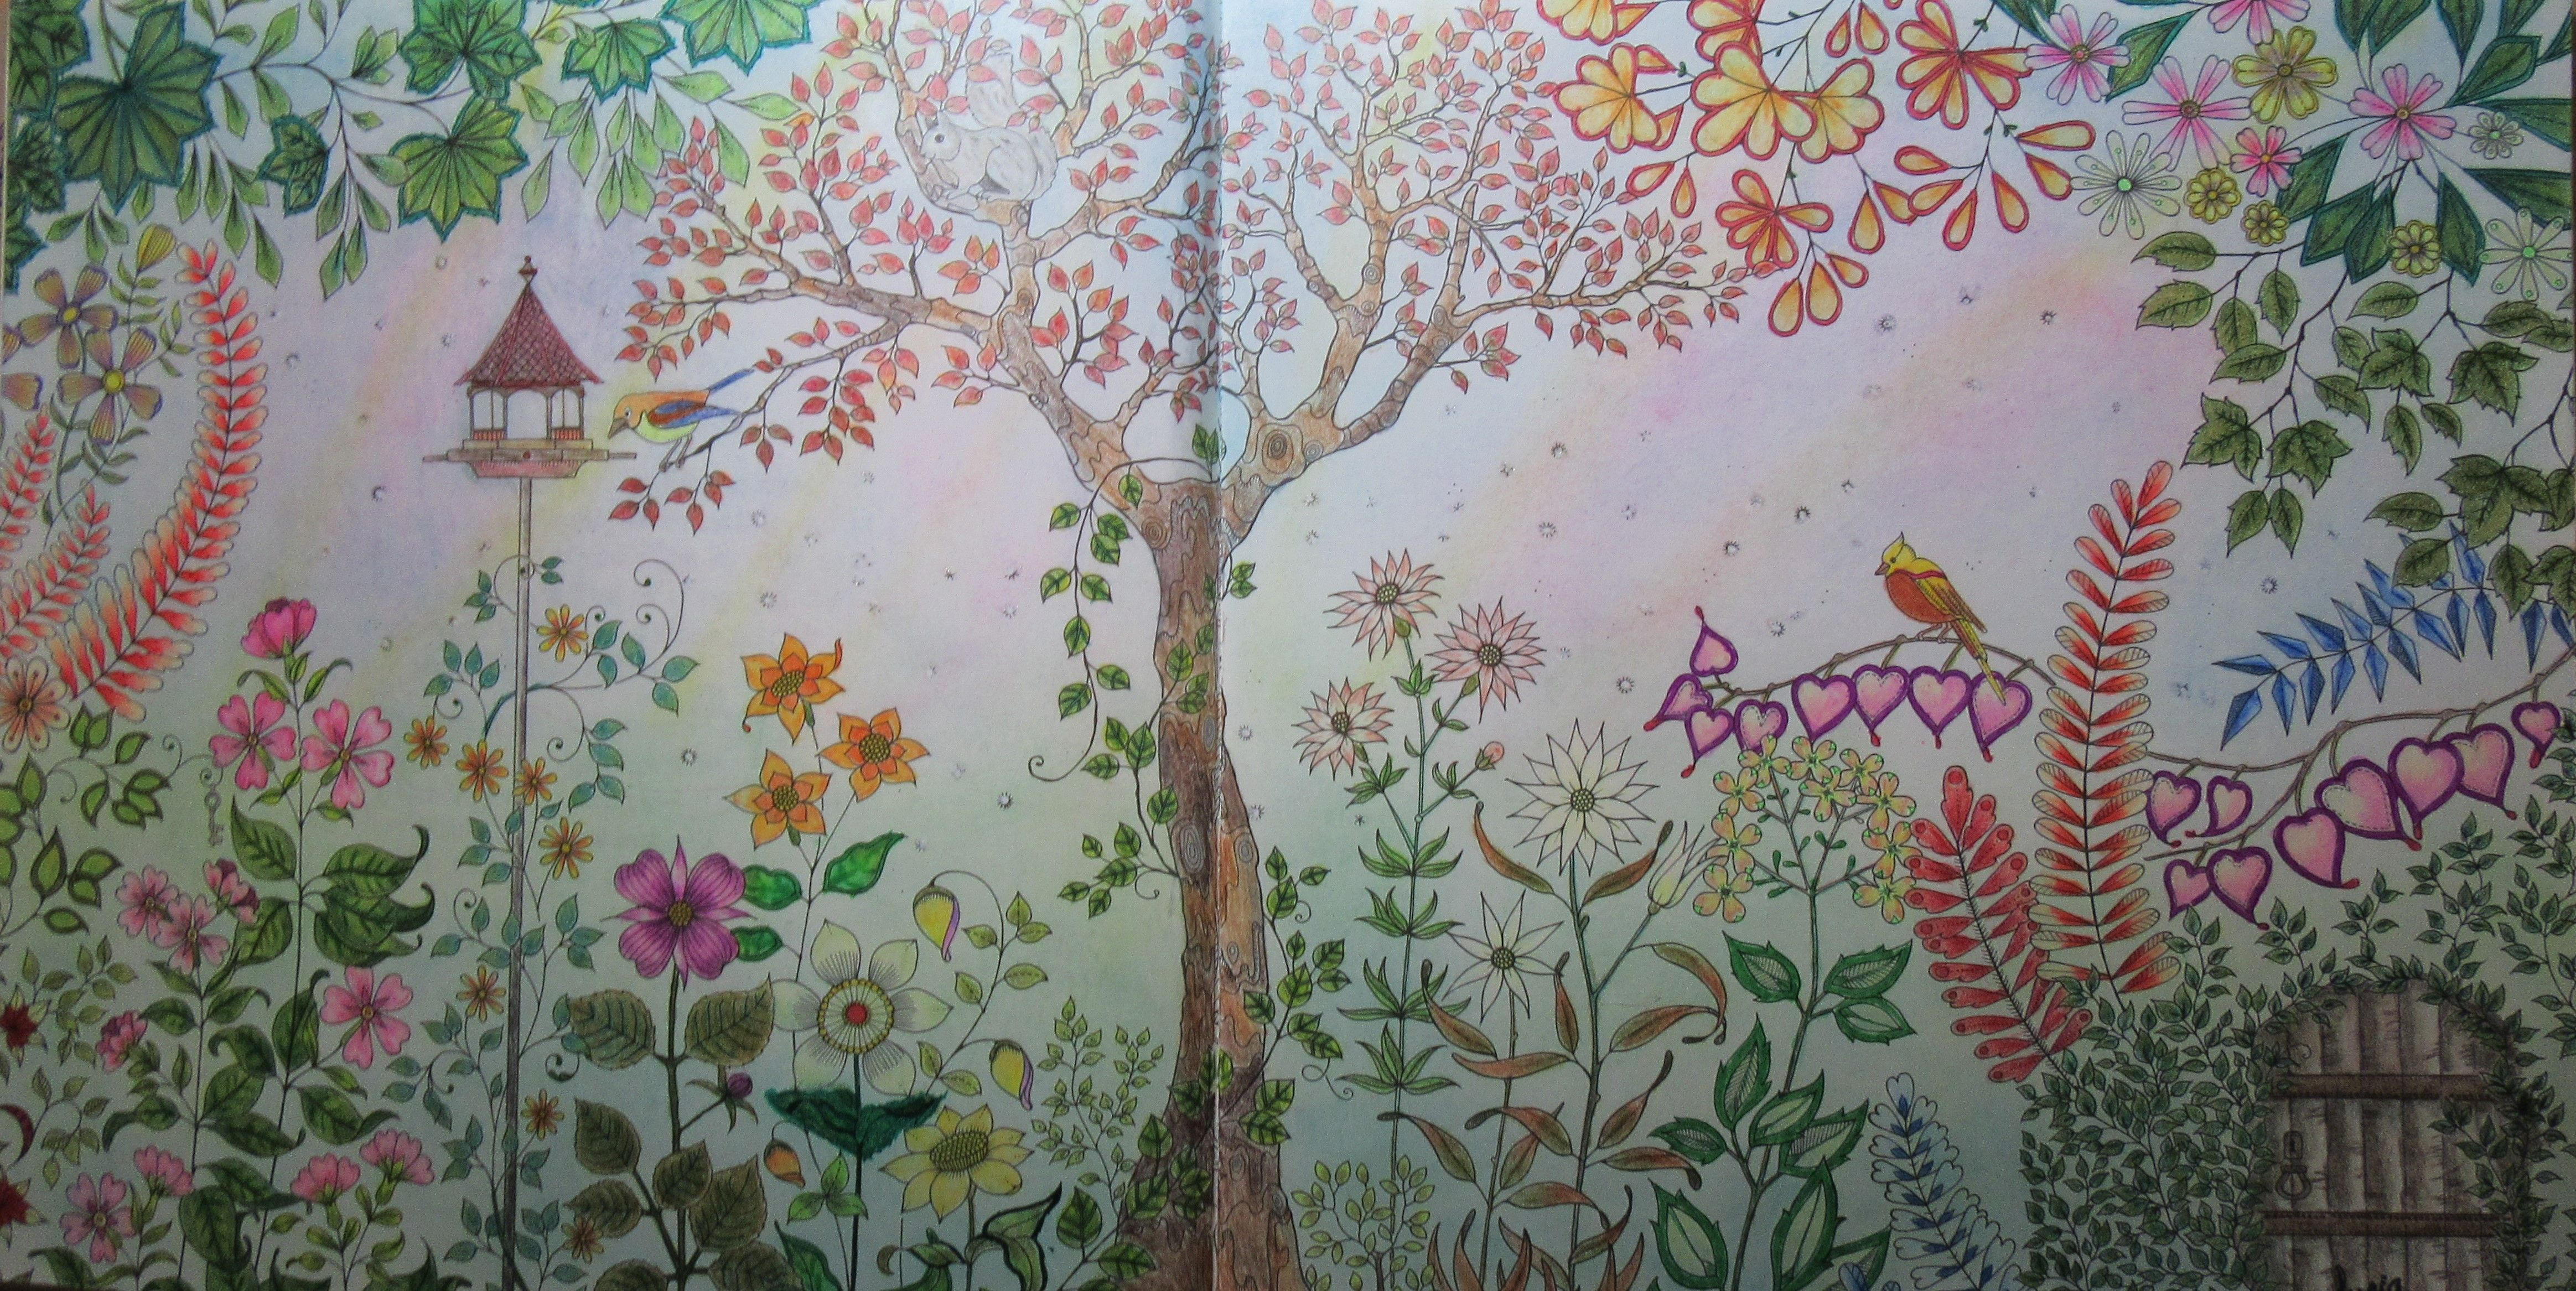 Johanna Basford Secret Garden Coloring Book Done In Prismacolor Premier Pencils Gel Pen And